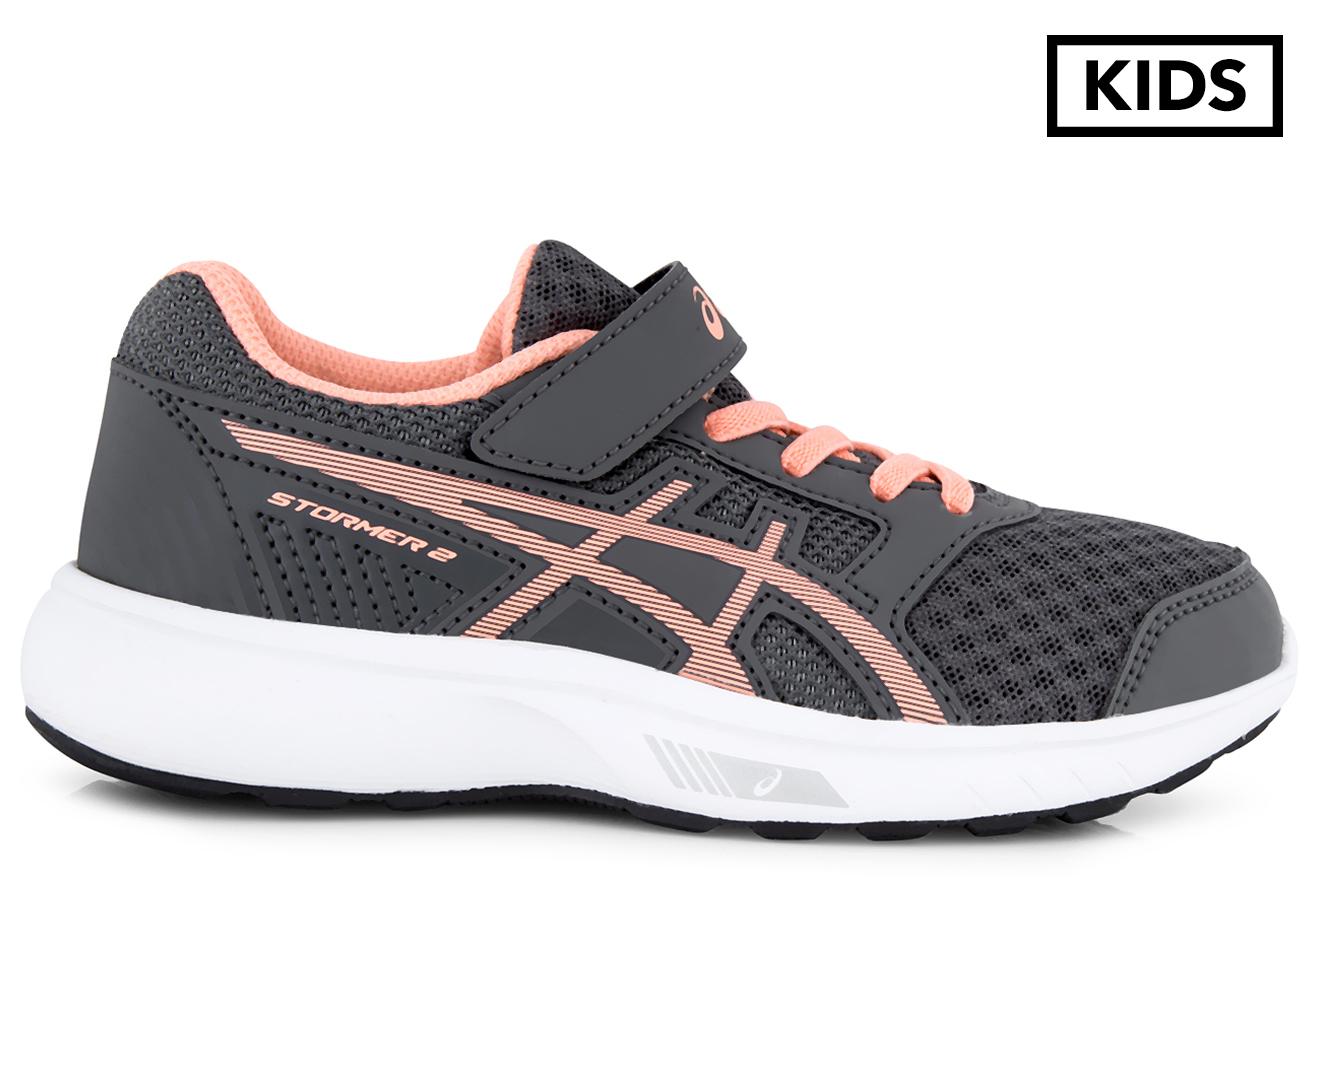 ASICS Pre-School Girls  Stormer 2 Shoe - Carbon Begonia Pink White ... 776cbd8d7e4